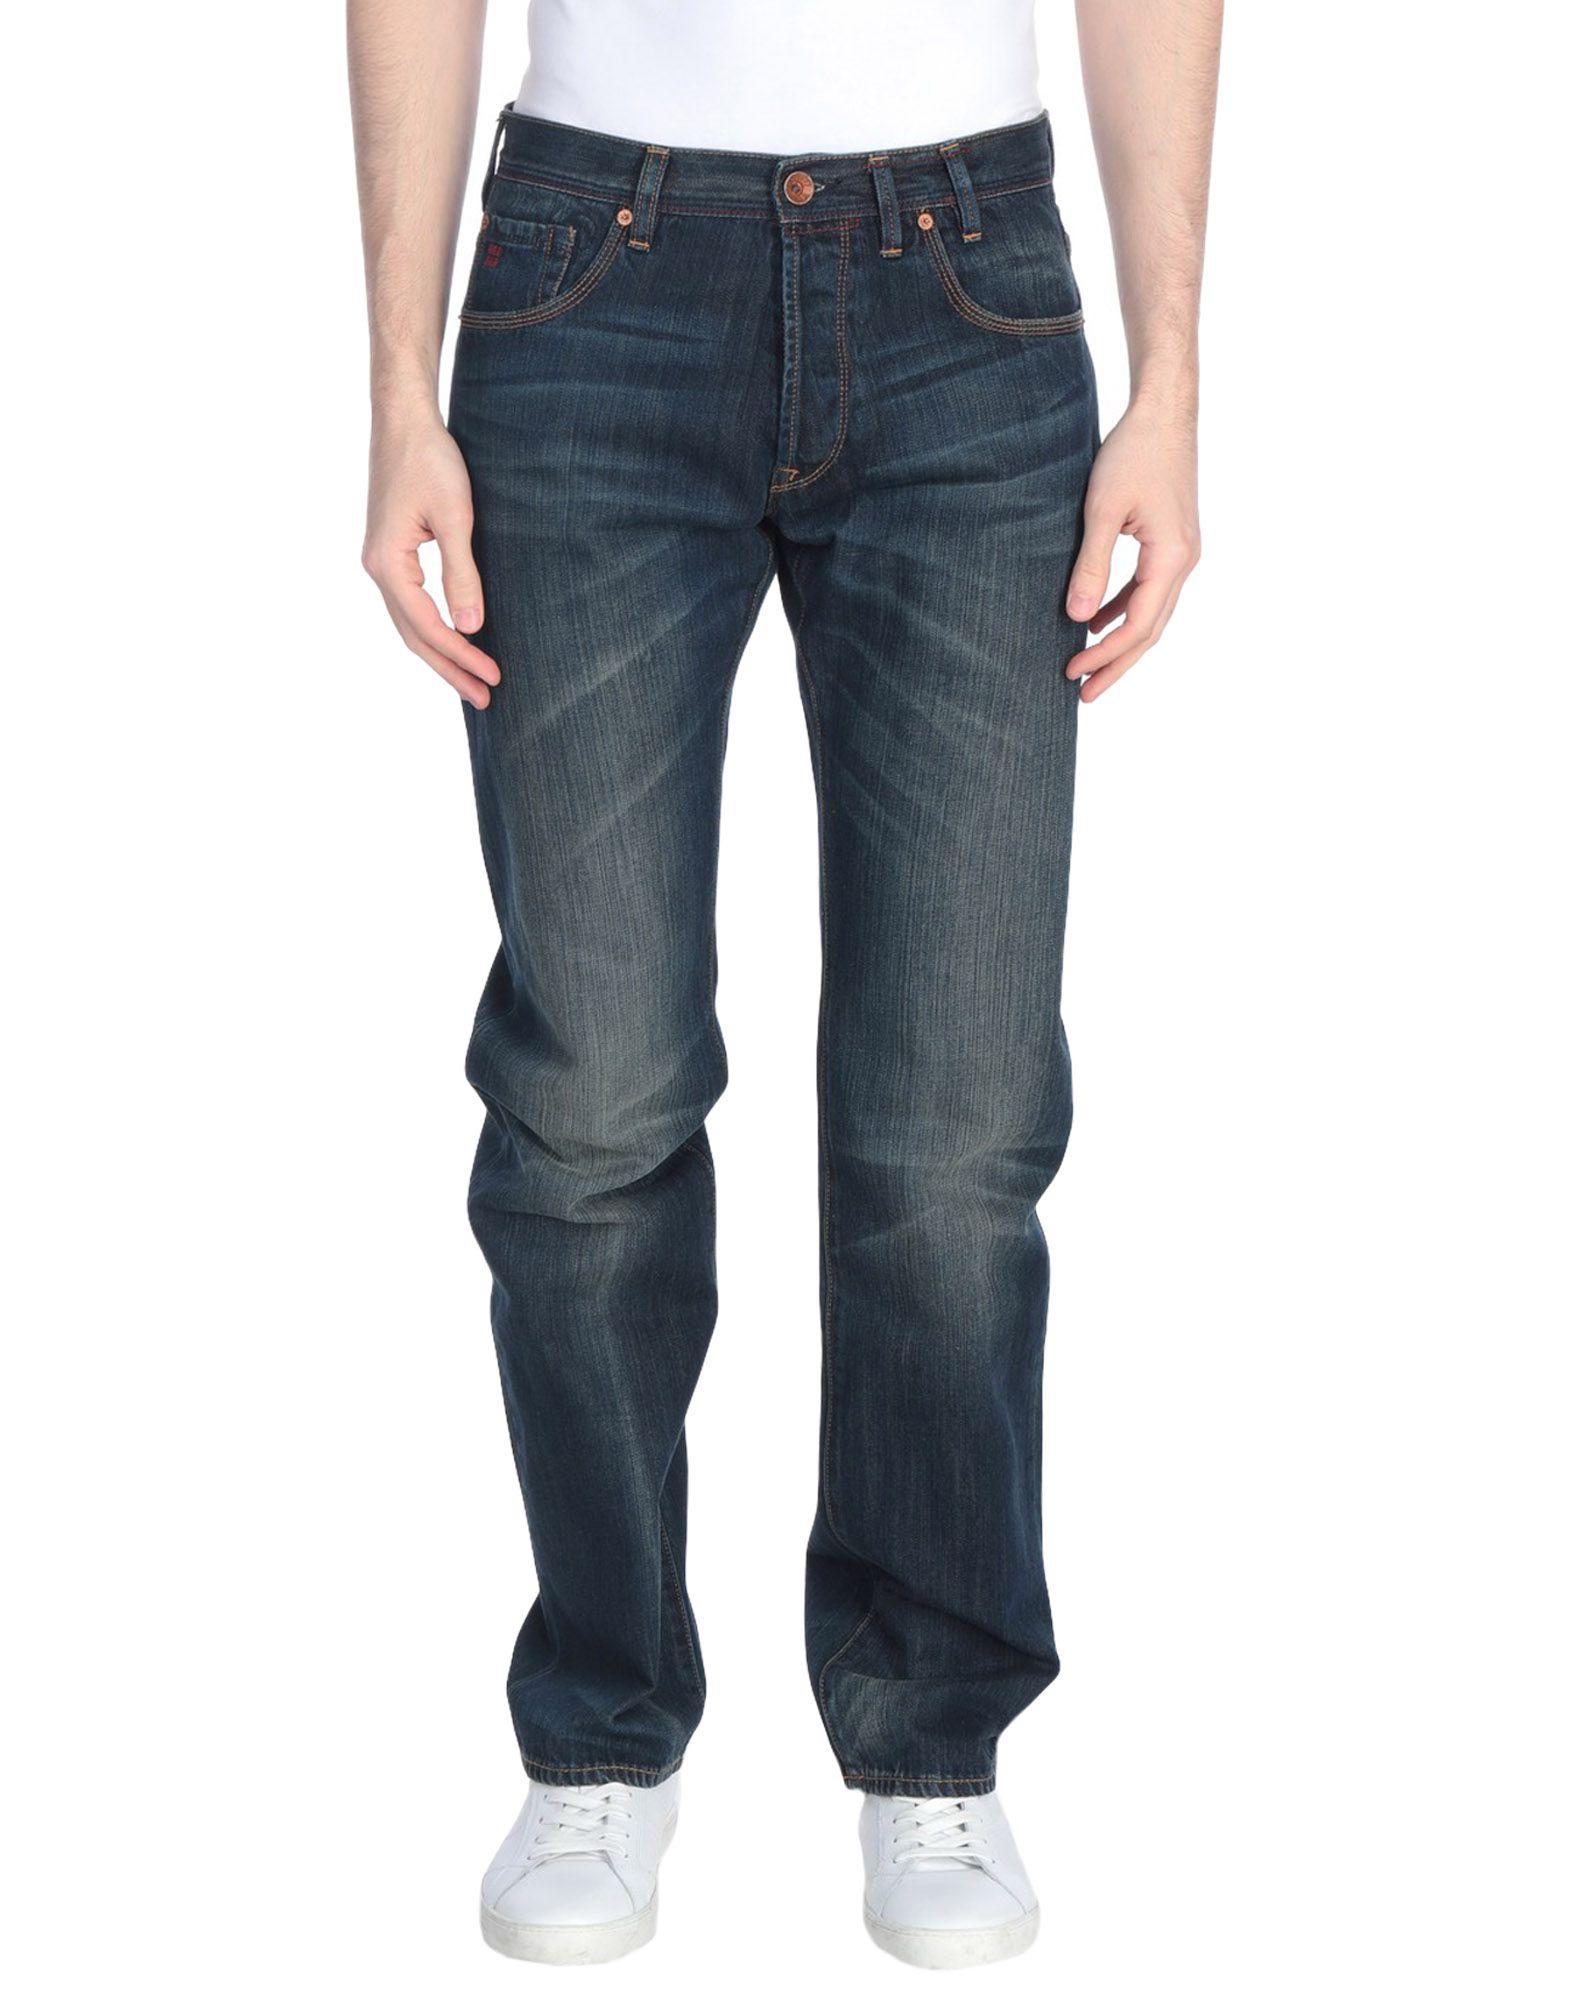 Фото - PAUL SMITH Джинсовые брюки jean paul gaultier le male